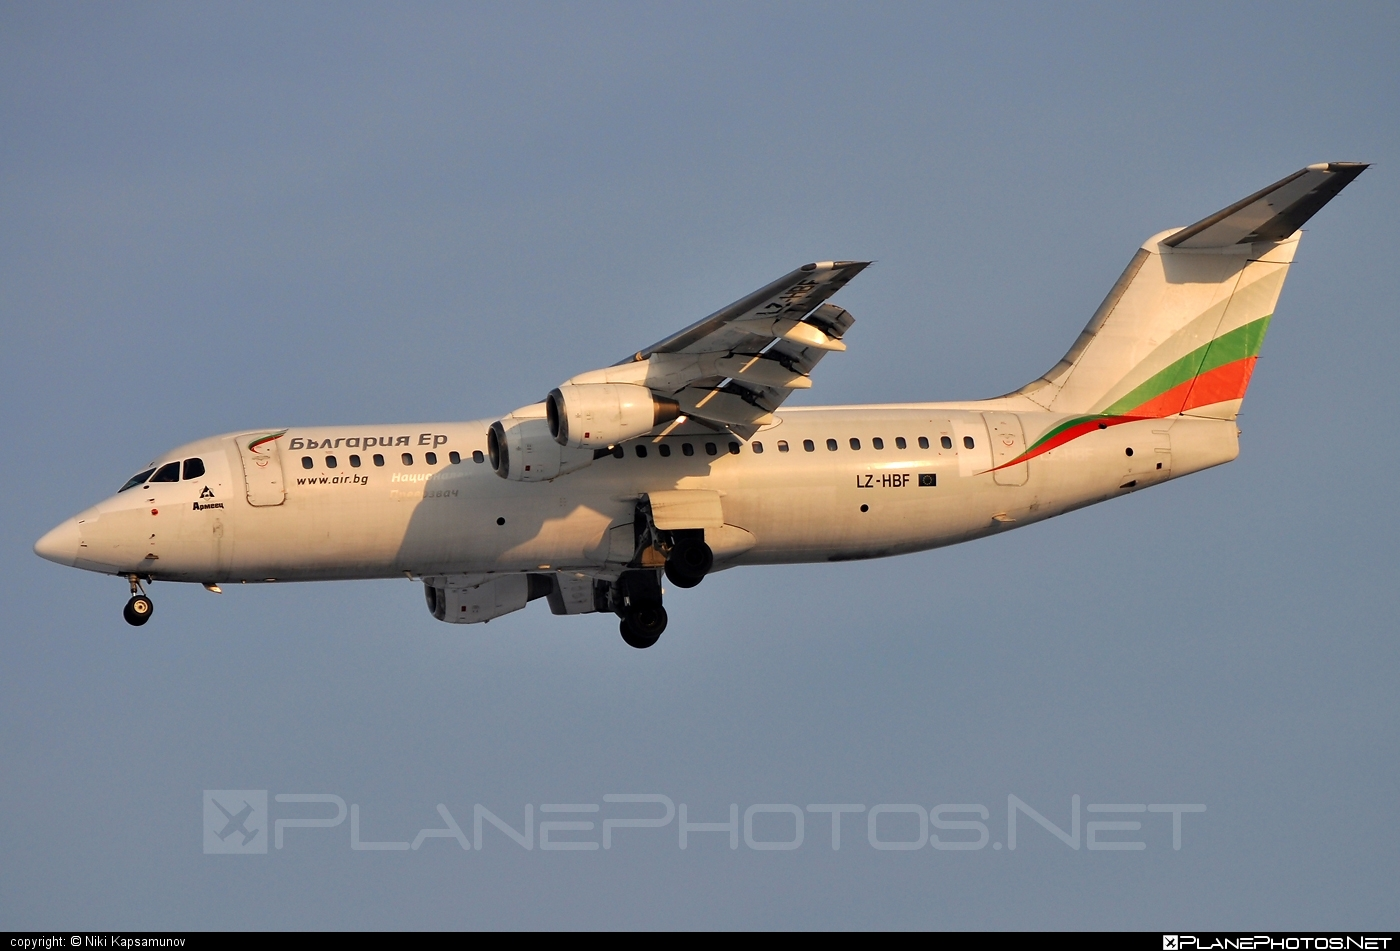 British Aerospace BAe 146-300 - LZ-HBF operated by Bulgaria Air #bae146 #bae146300 #britishaerospace #bulgariaair #jumbolino